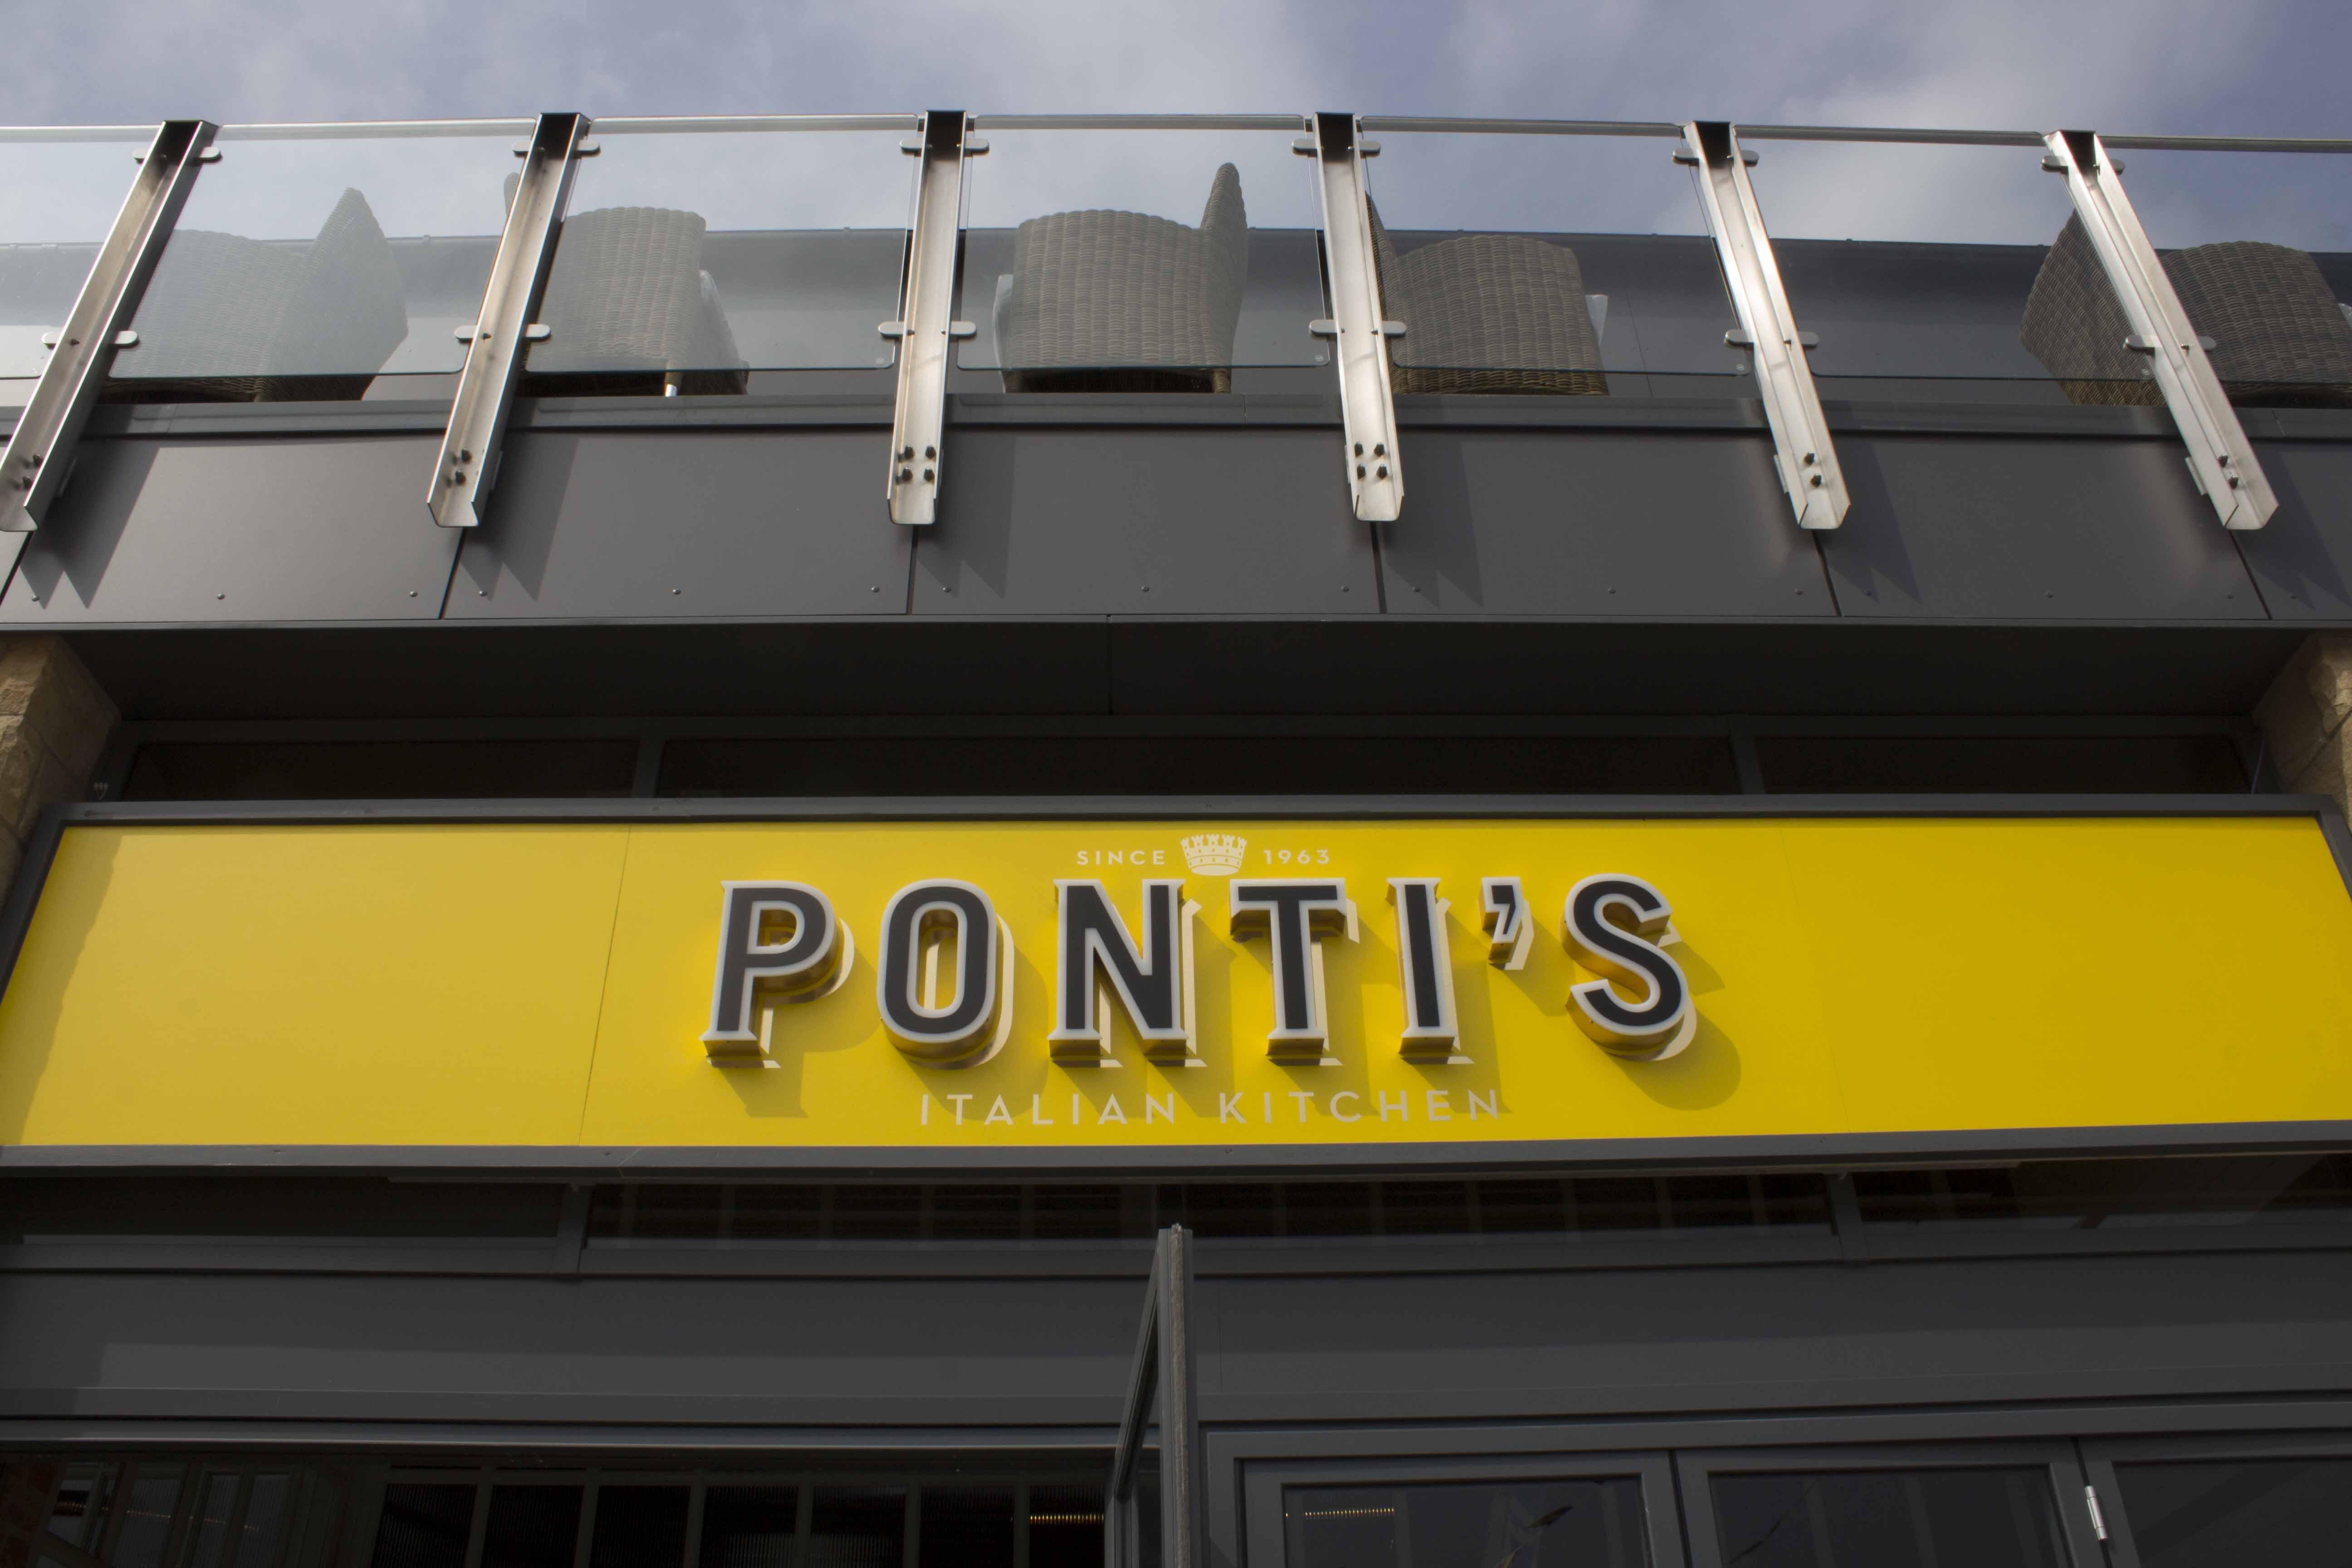 Pontis front 1